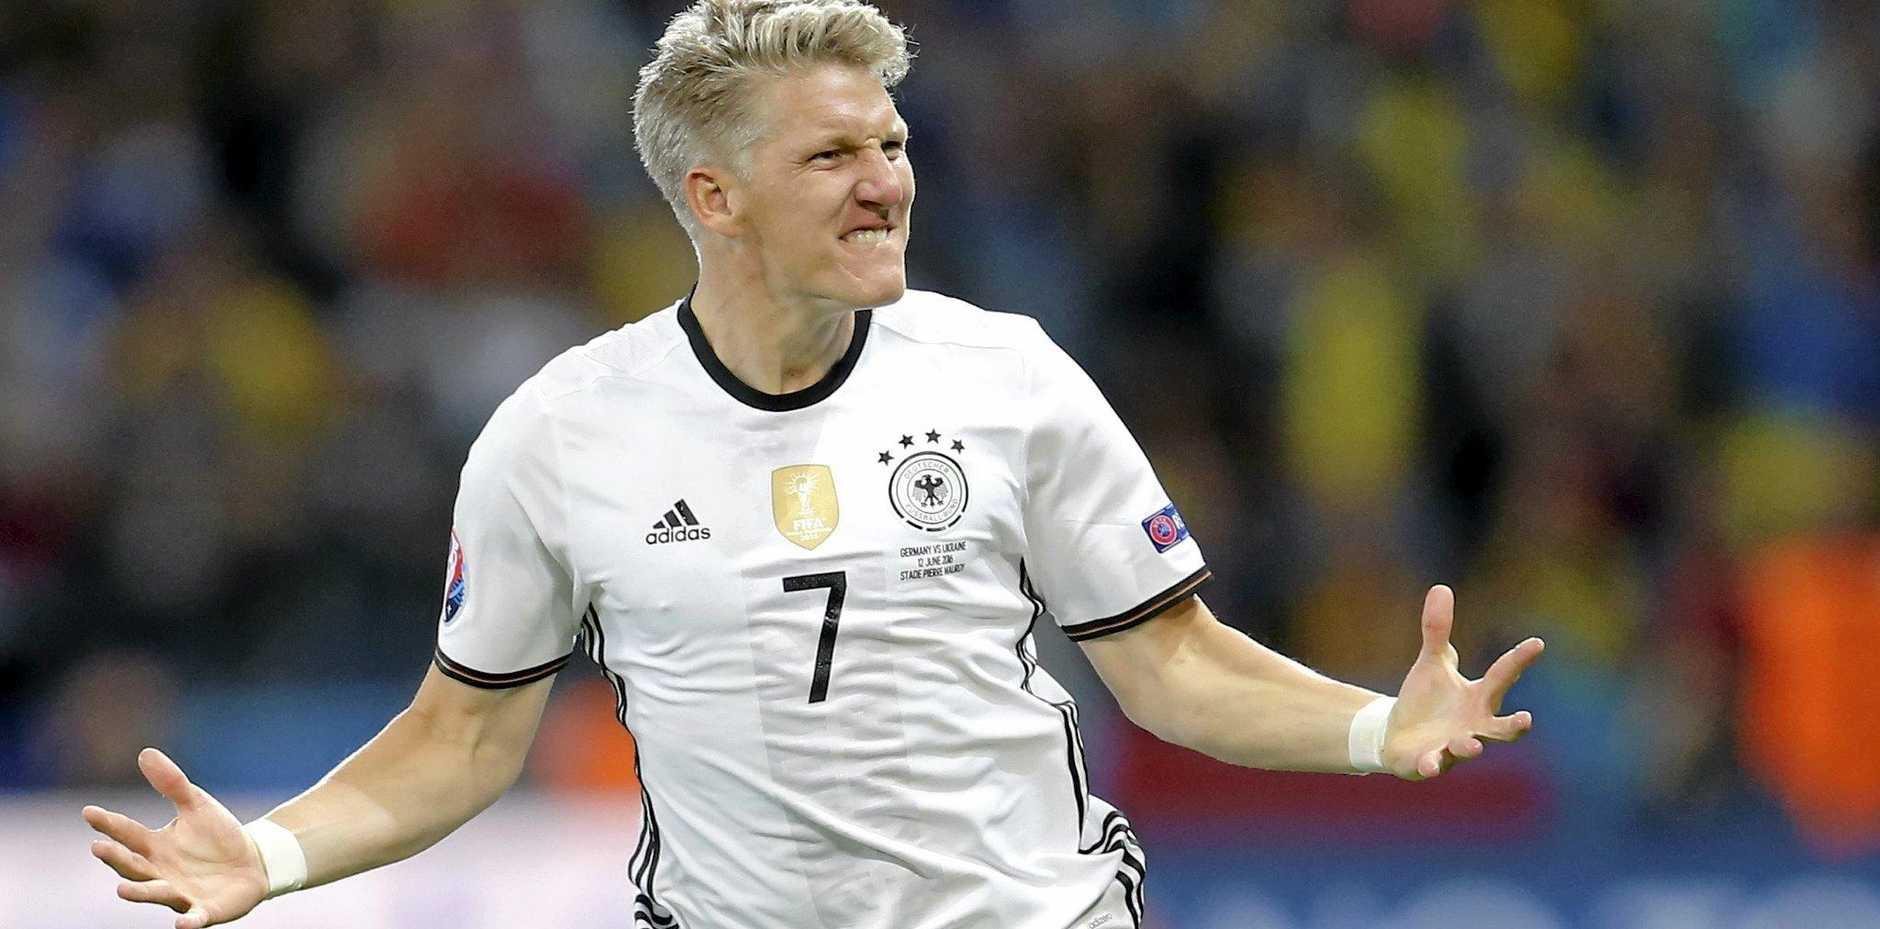 Germany's Bastian Schweinsteiger celebrates after scoring his side's second goal.